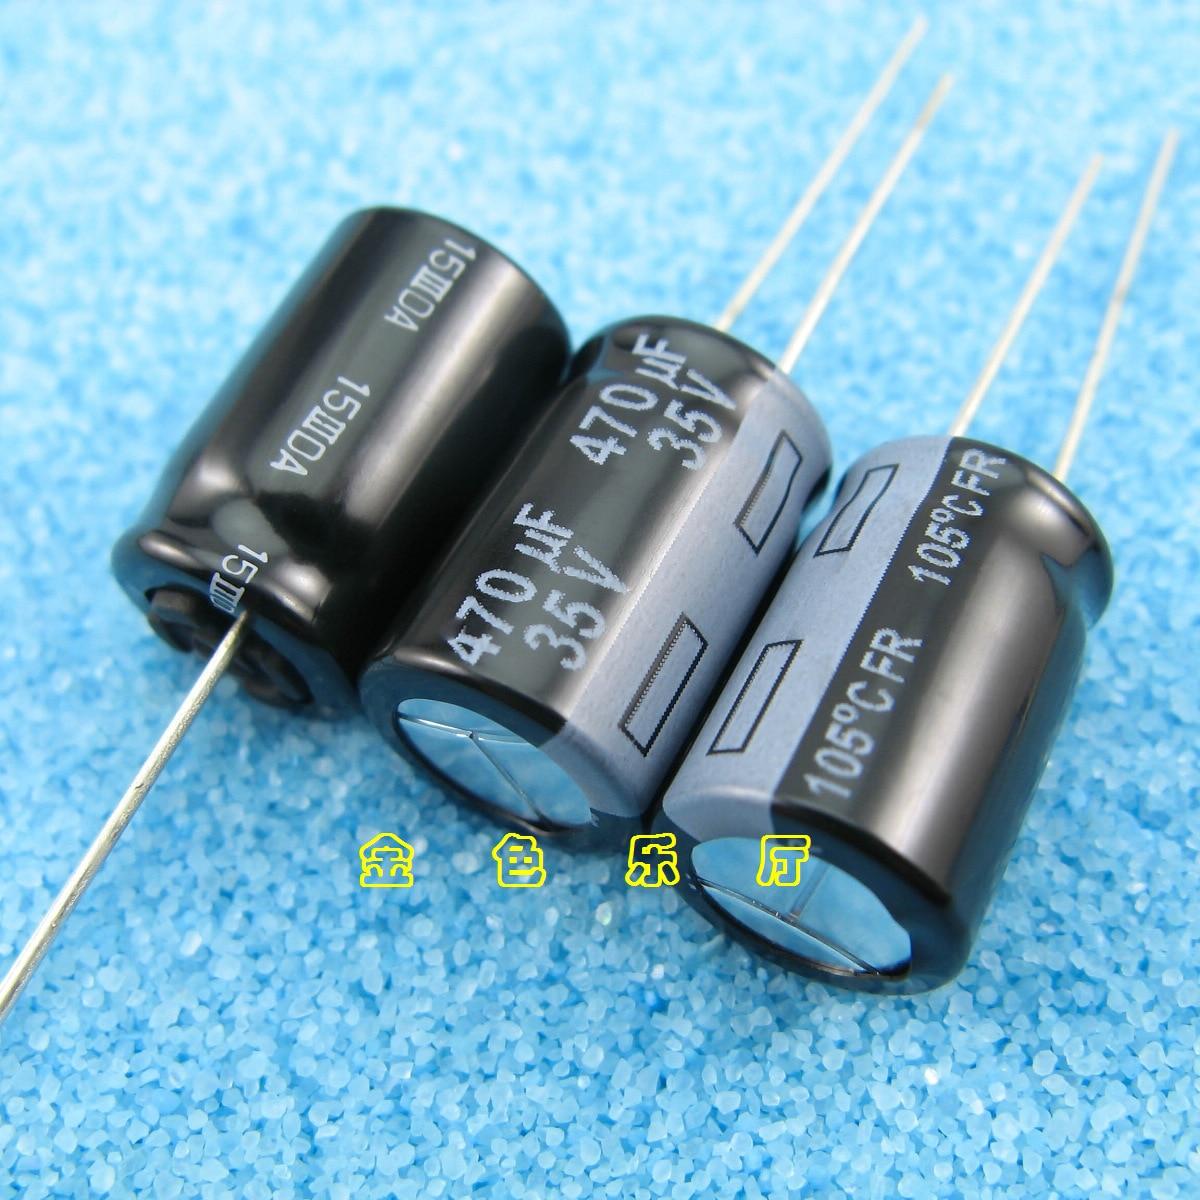 30pcs/lot Original Matsushita FR series ultra-low internal resistance audio fever aluminum electrolytic capacitors free shipping